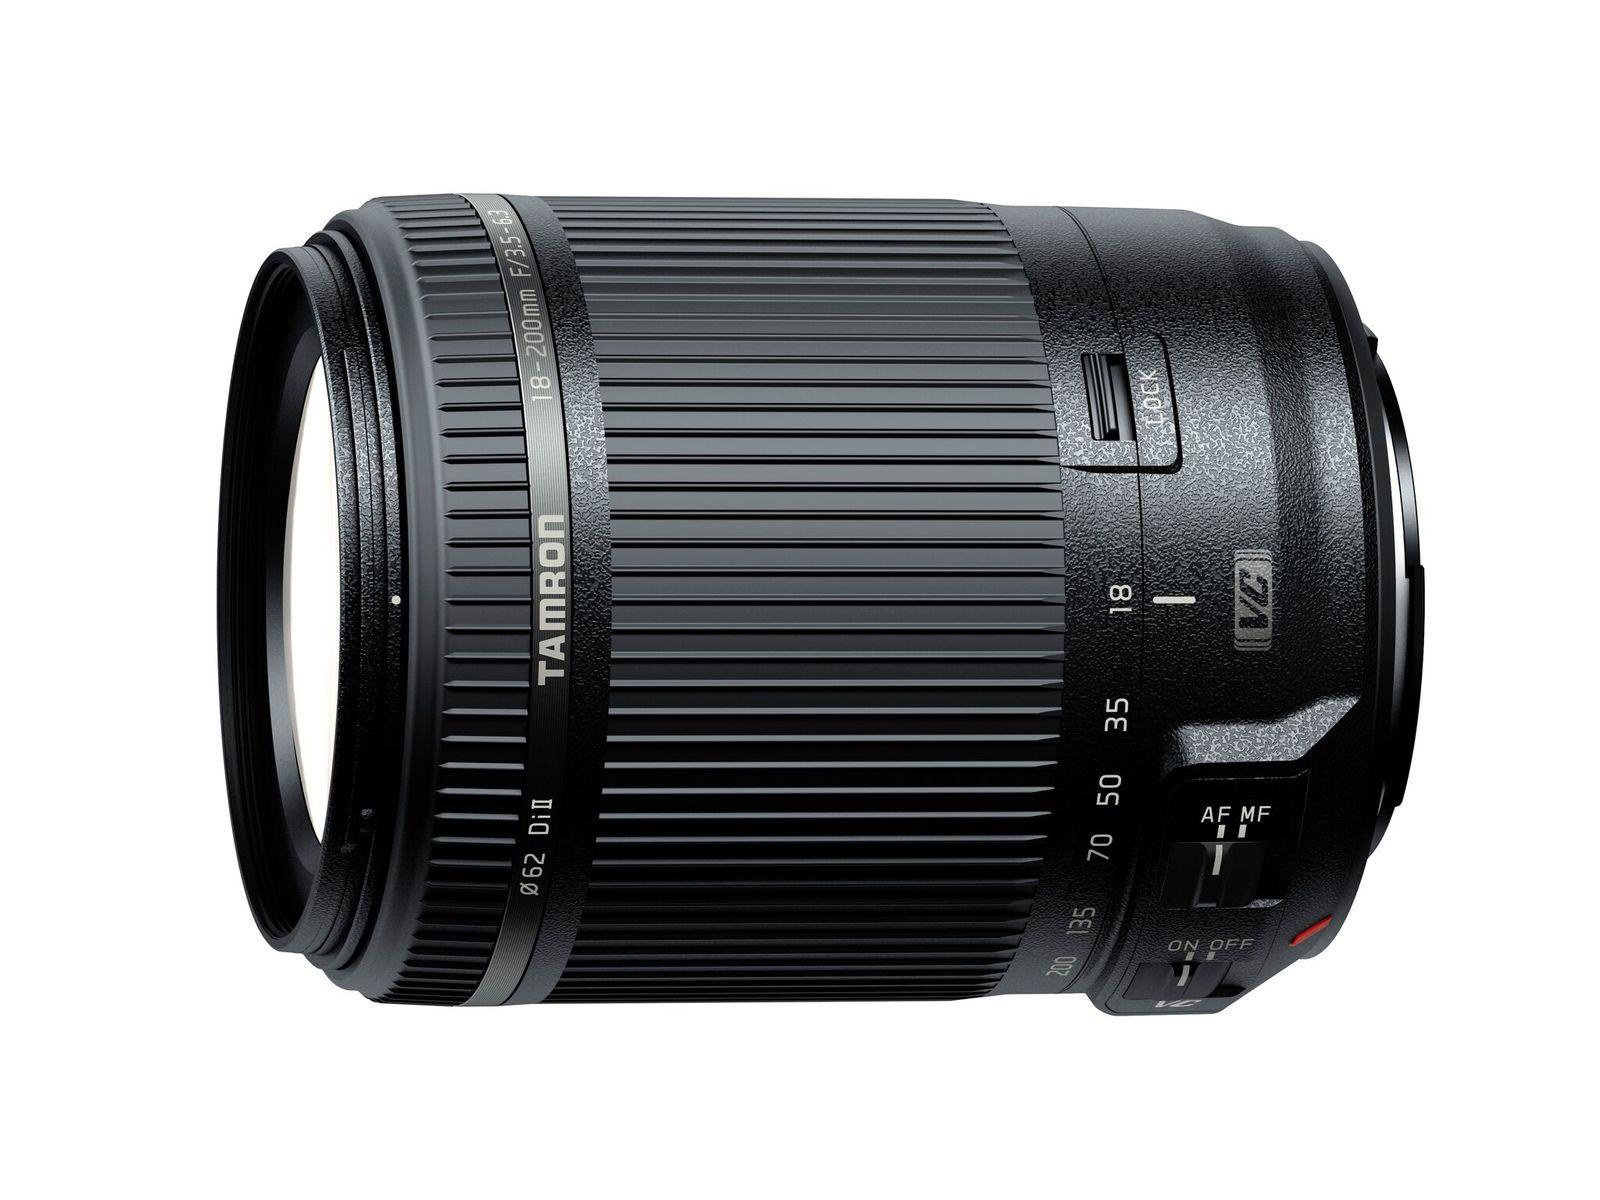 Tamron 18-200MM F3.5-6.3 DI II VC Canon image